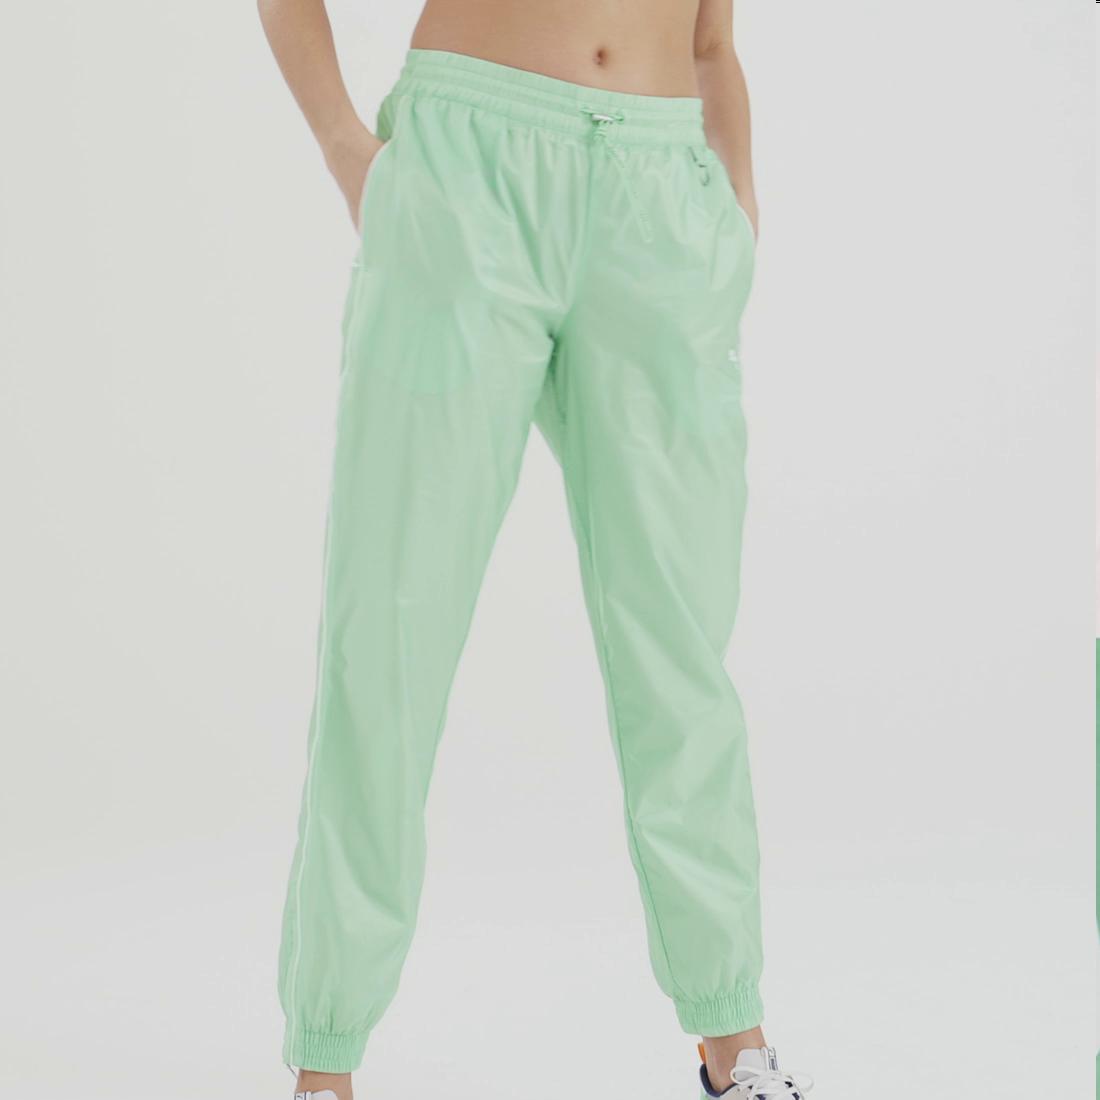 Image Puma Evide Women's Track Pants #7